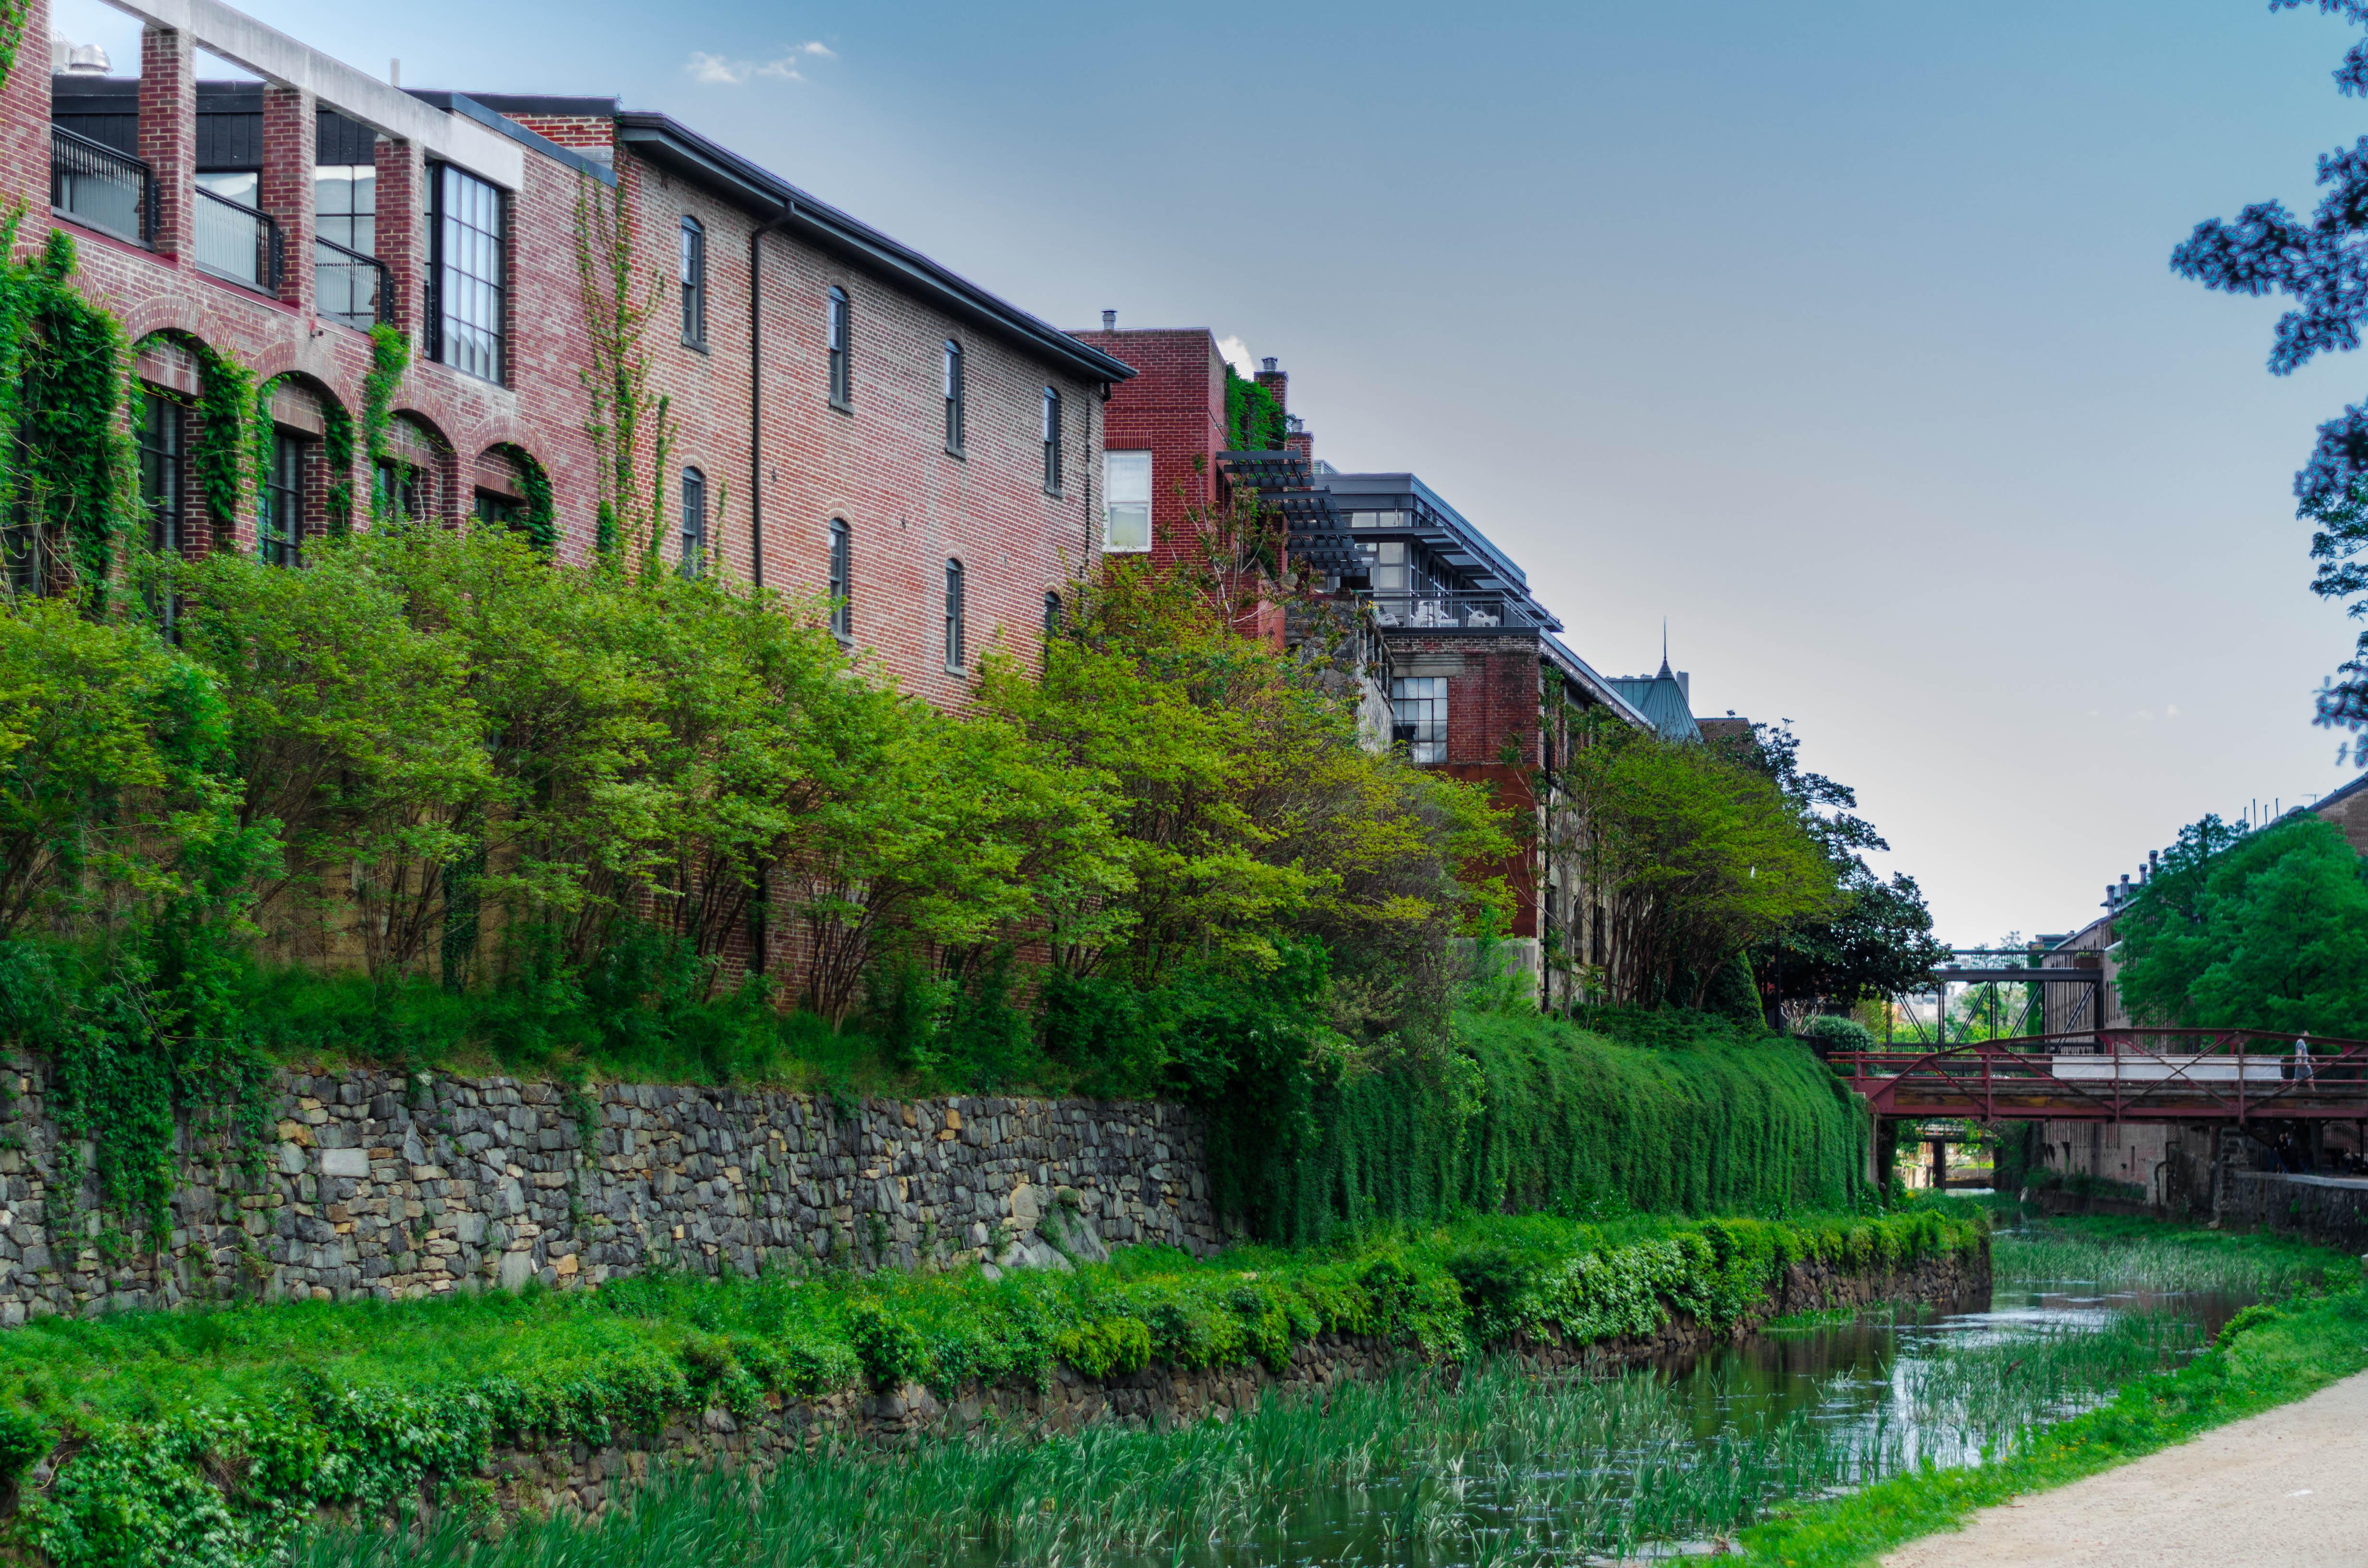 A canal along a walking path. Brick buildings line the ridges.